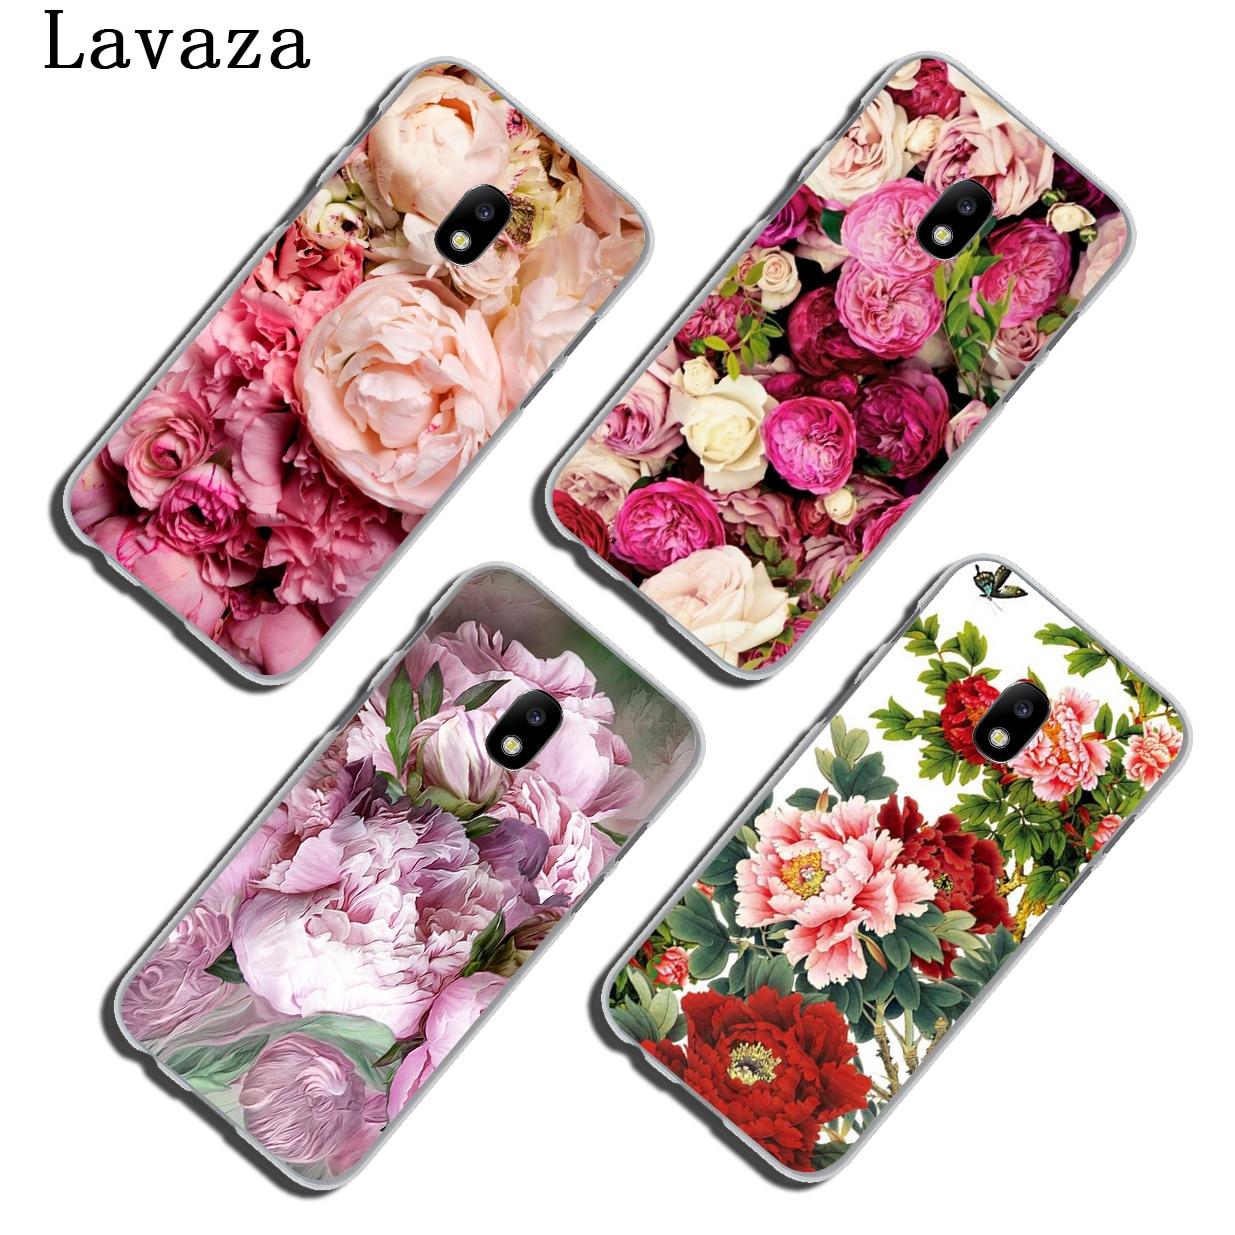 Lavaza Peony Sunflowe Rose Daisy Plum Plants Flower Phone Case for Samsung Galaxy A3 A5 J3 J5 J7 2015 2016 2017 Grand Prime A5